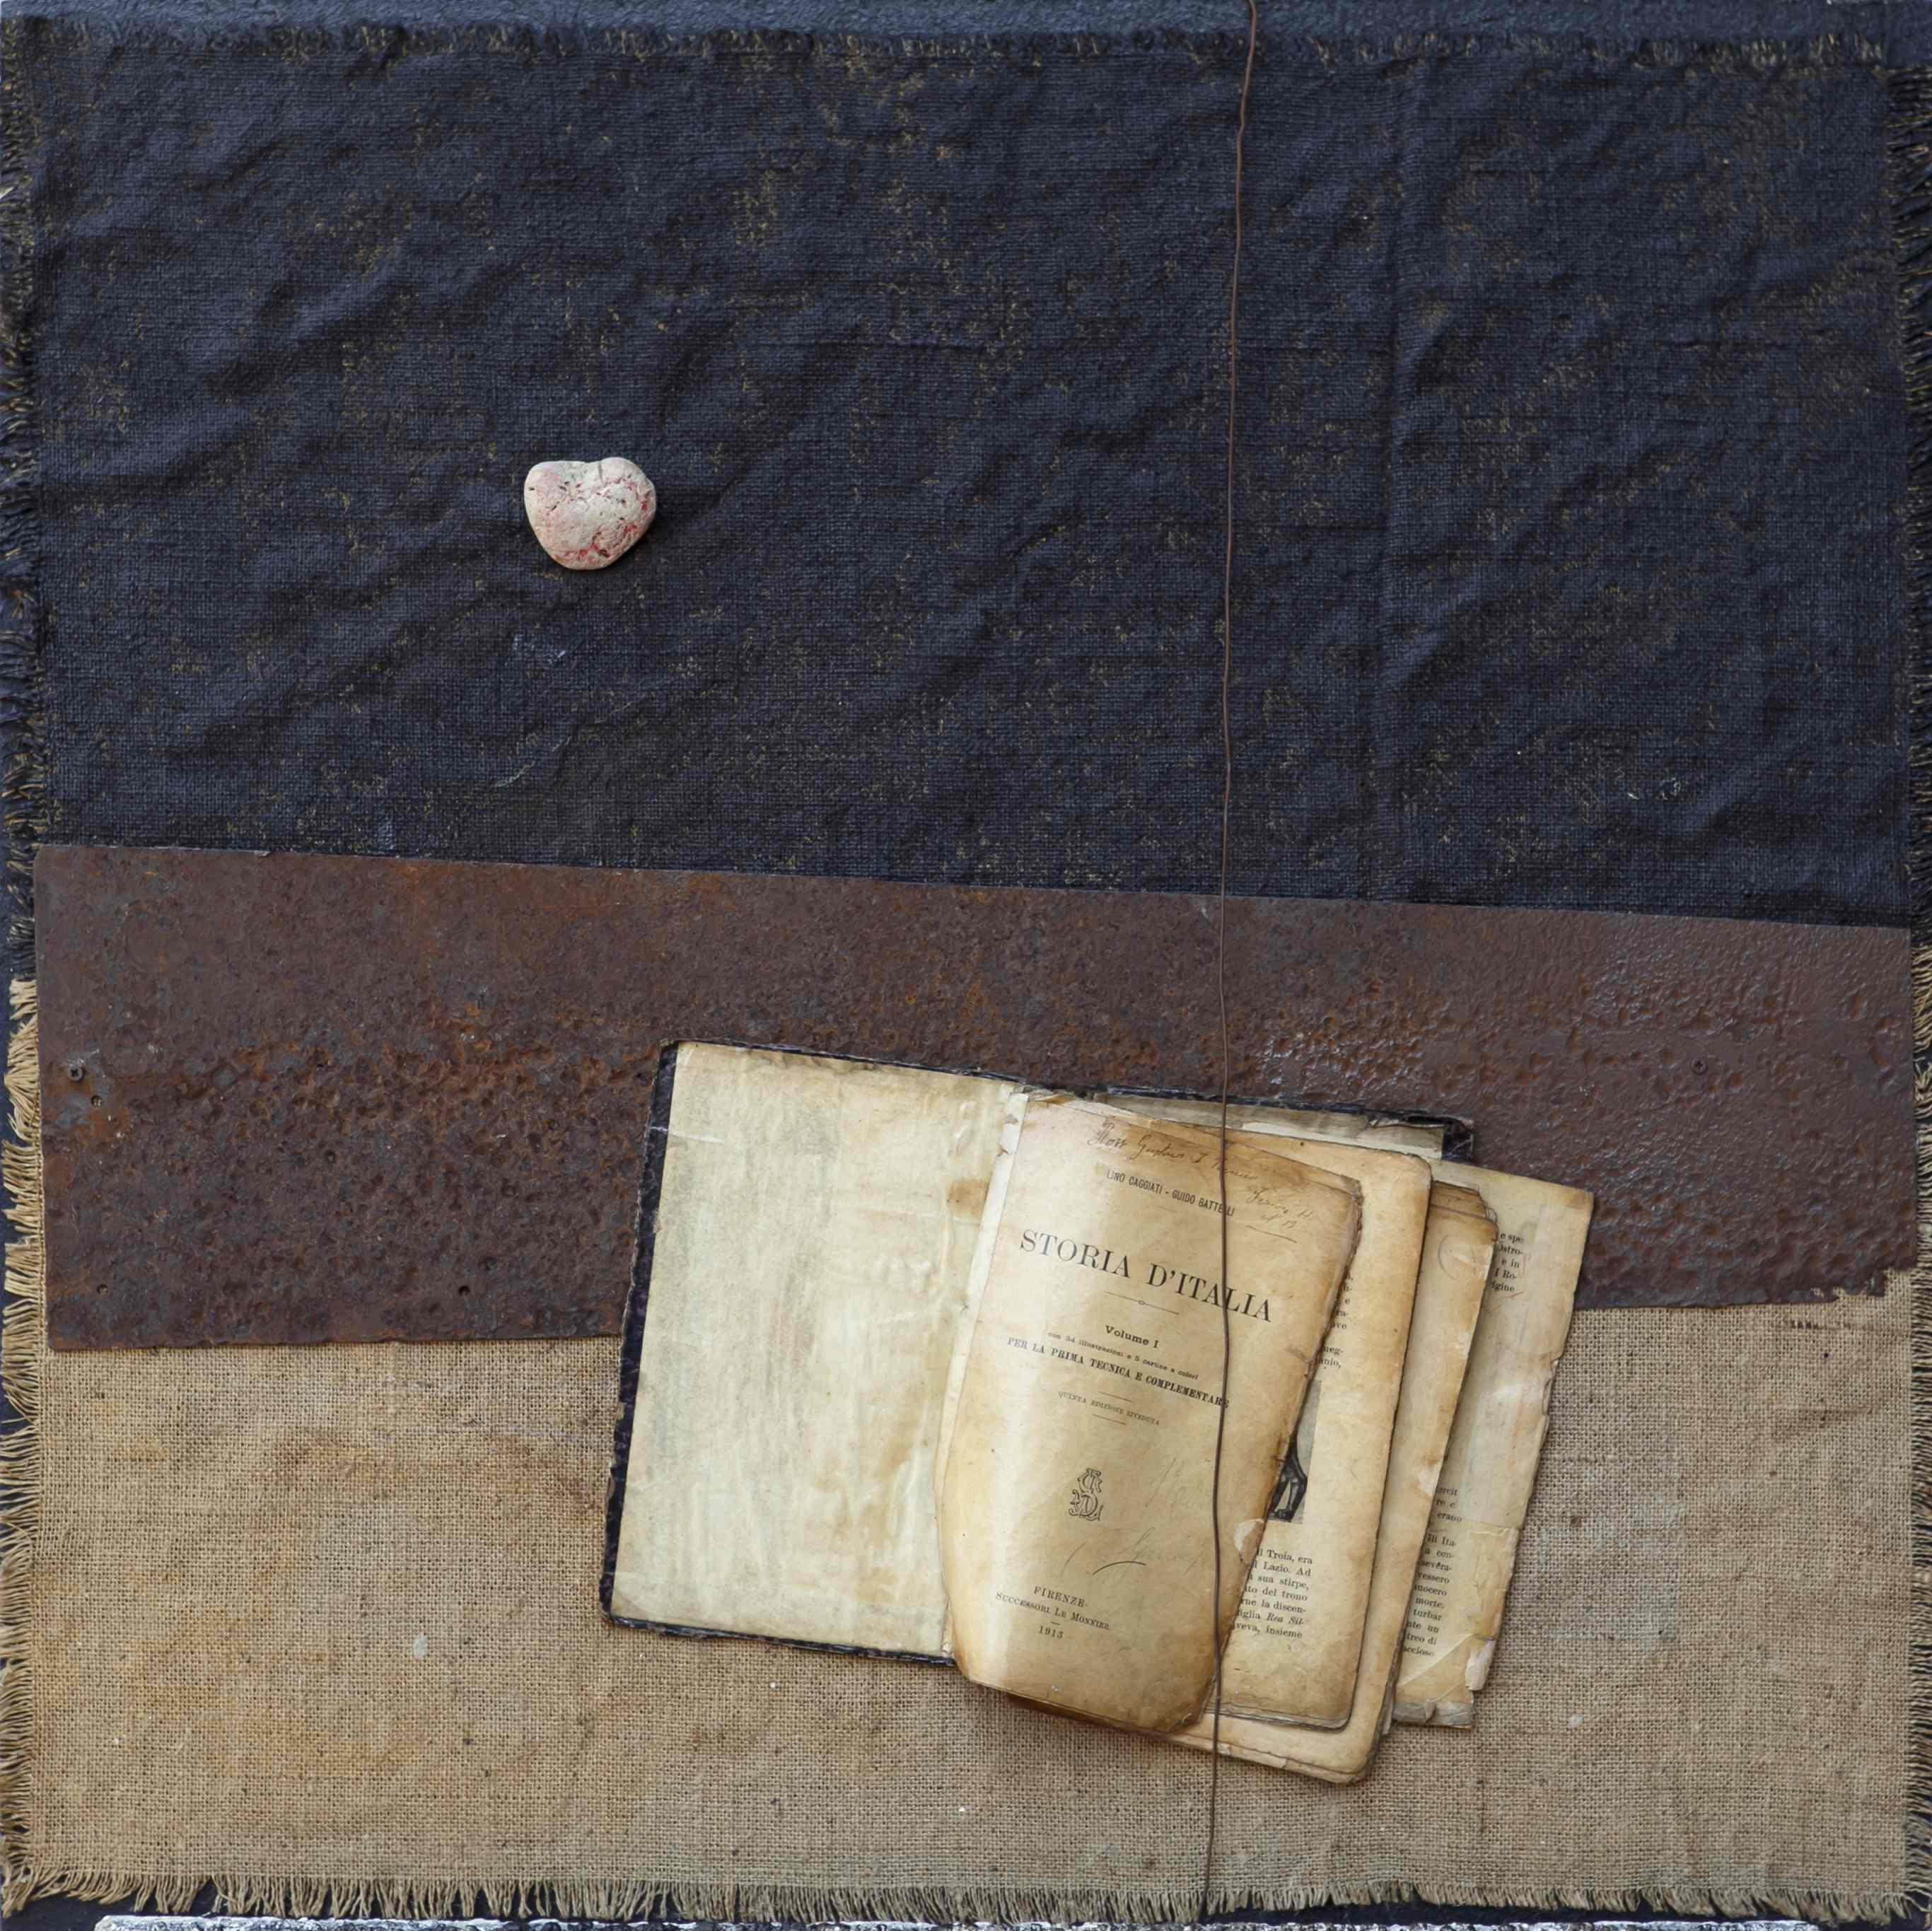 Memorie, ferro corroso, juta, libro e sasso su tavola, 70x70, 2013